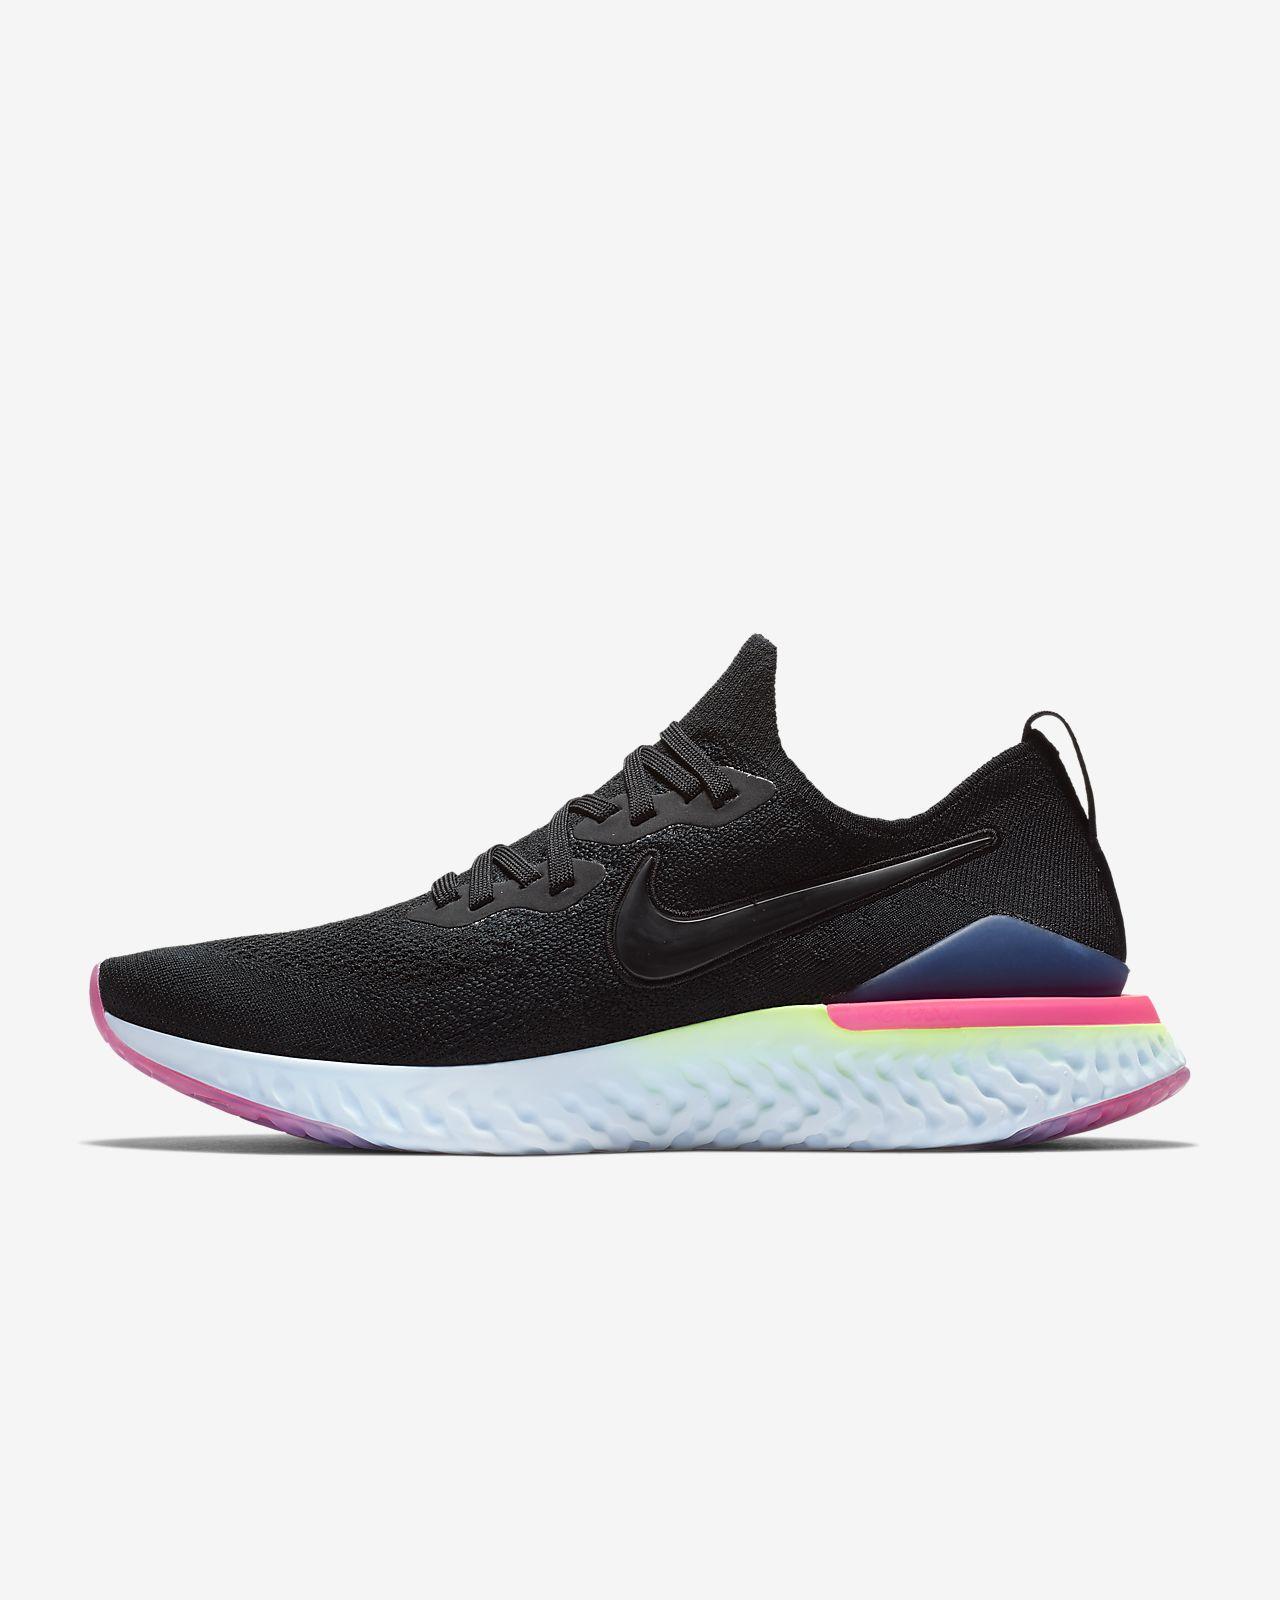 3df355208a710 Low Resolution Nike Epic React Flyknit 2 Men s Running Shoe Nike Epic React Flyknit  2 Men s Running Shoe